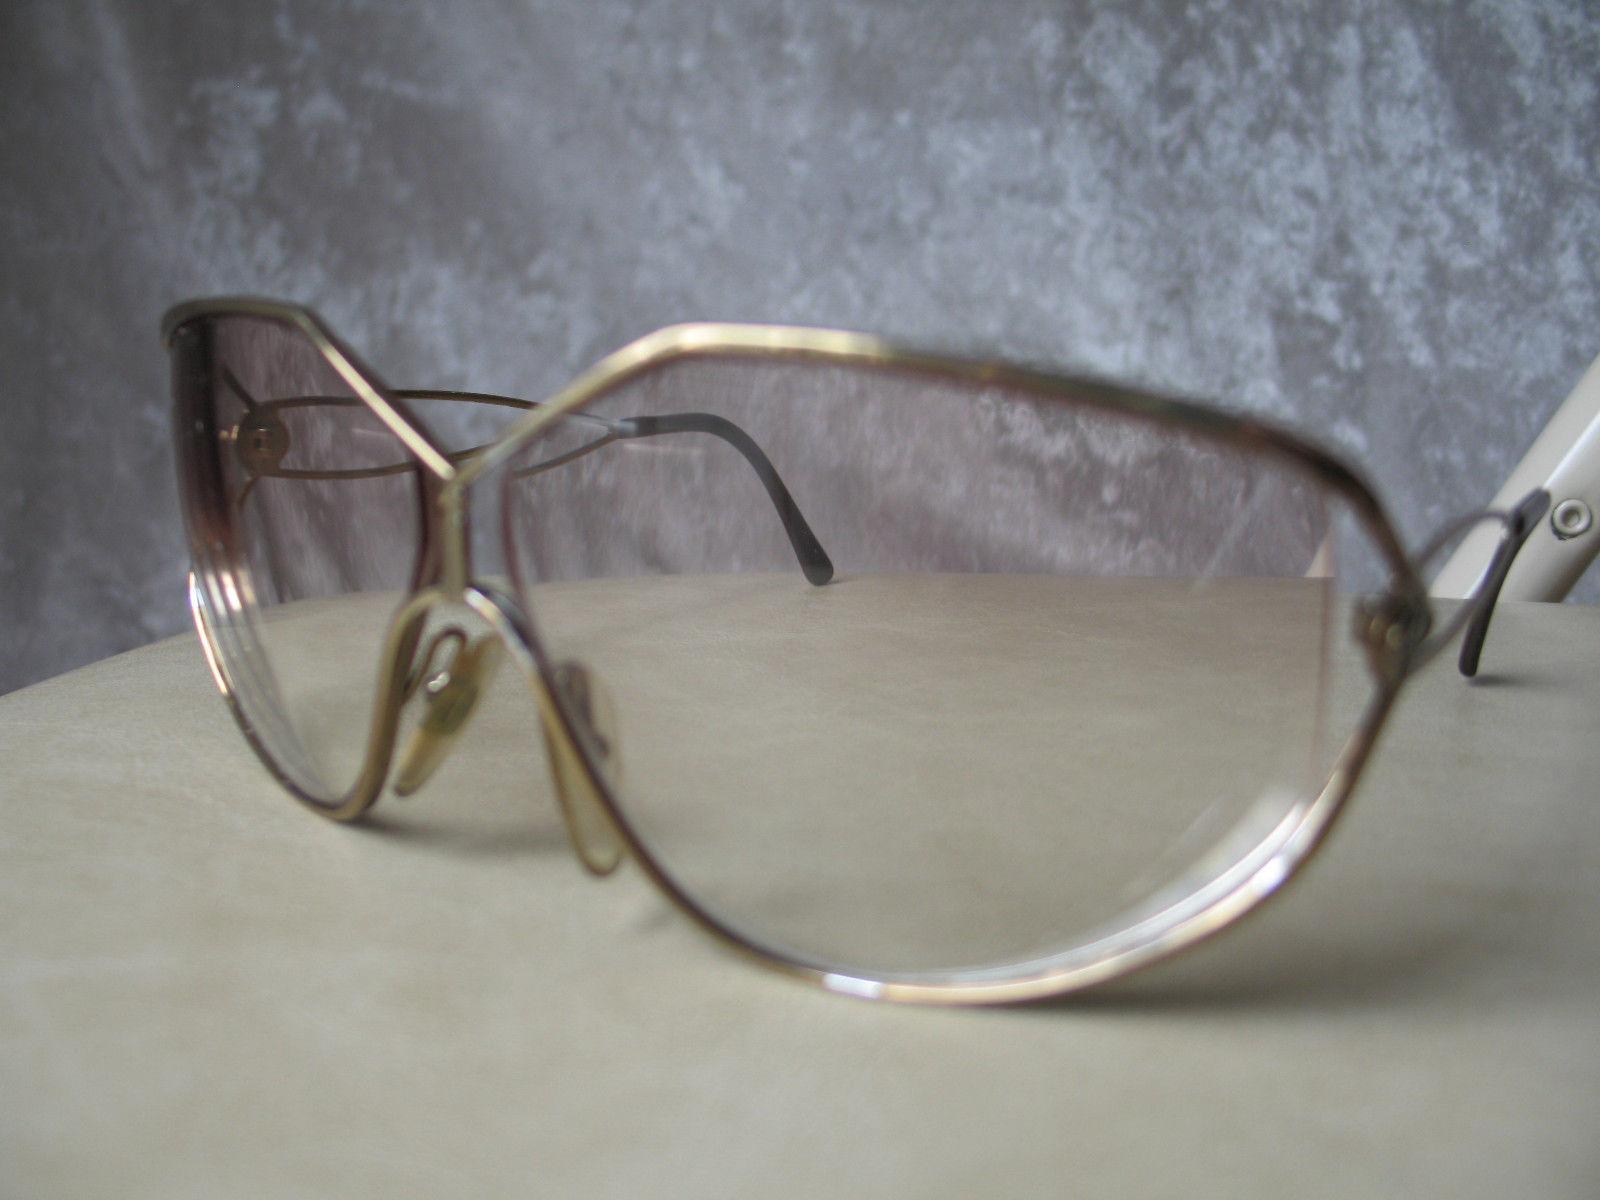 Vintage Dior Eyeglass Frames : VINTAGE CHRISTIAN DIOR BIG PRESCRIPTION SUN EYEGLASS ...